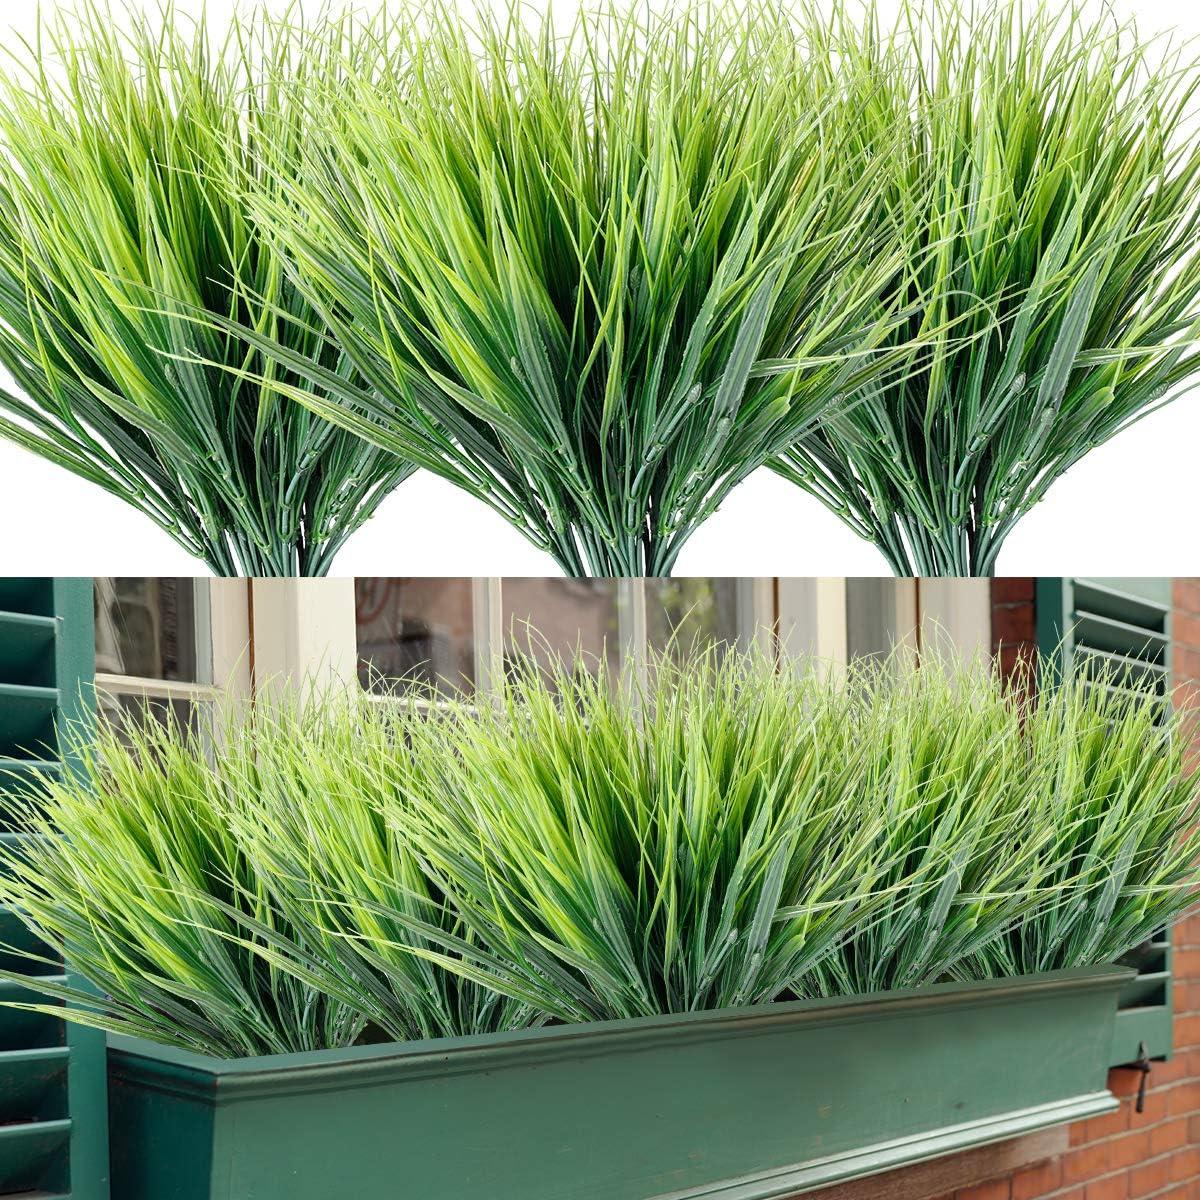 Artificial Grasses 12 Bundles Outdoor UV Resistant Fake Grass No Fade Faux Plastic Plants Garden Window Box Decorating(Green Grass)